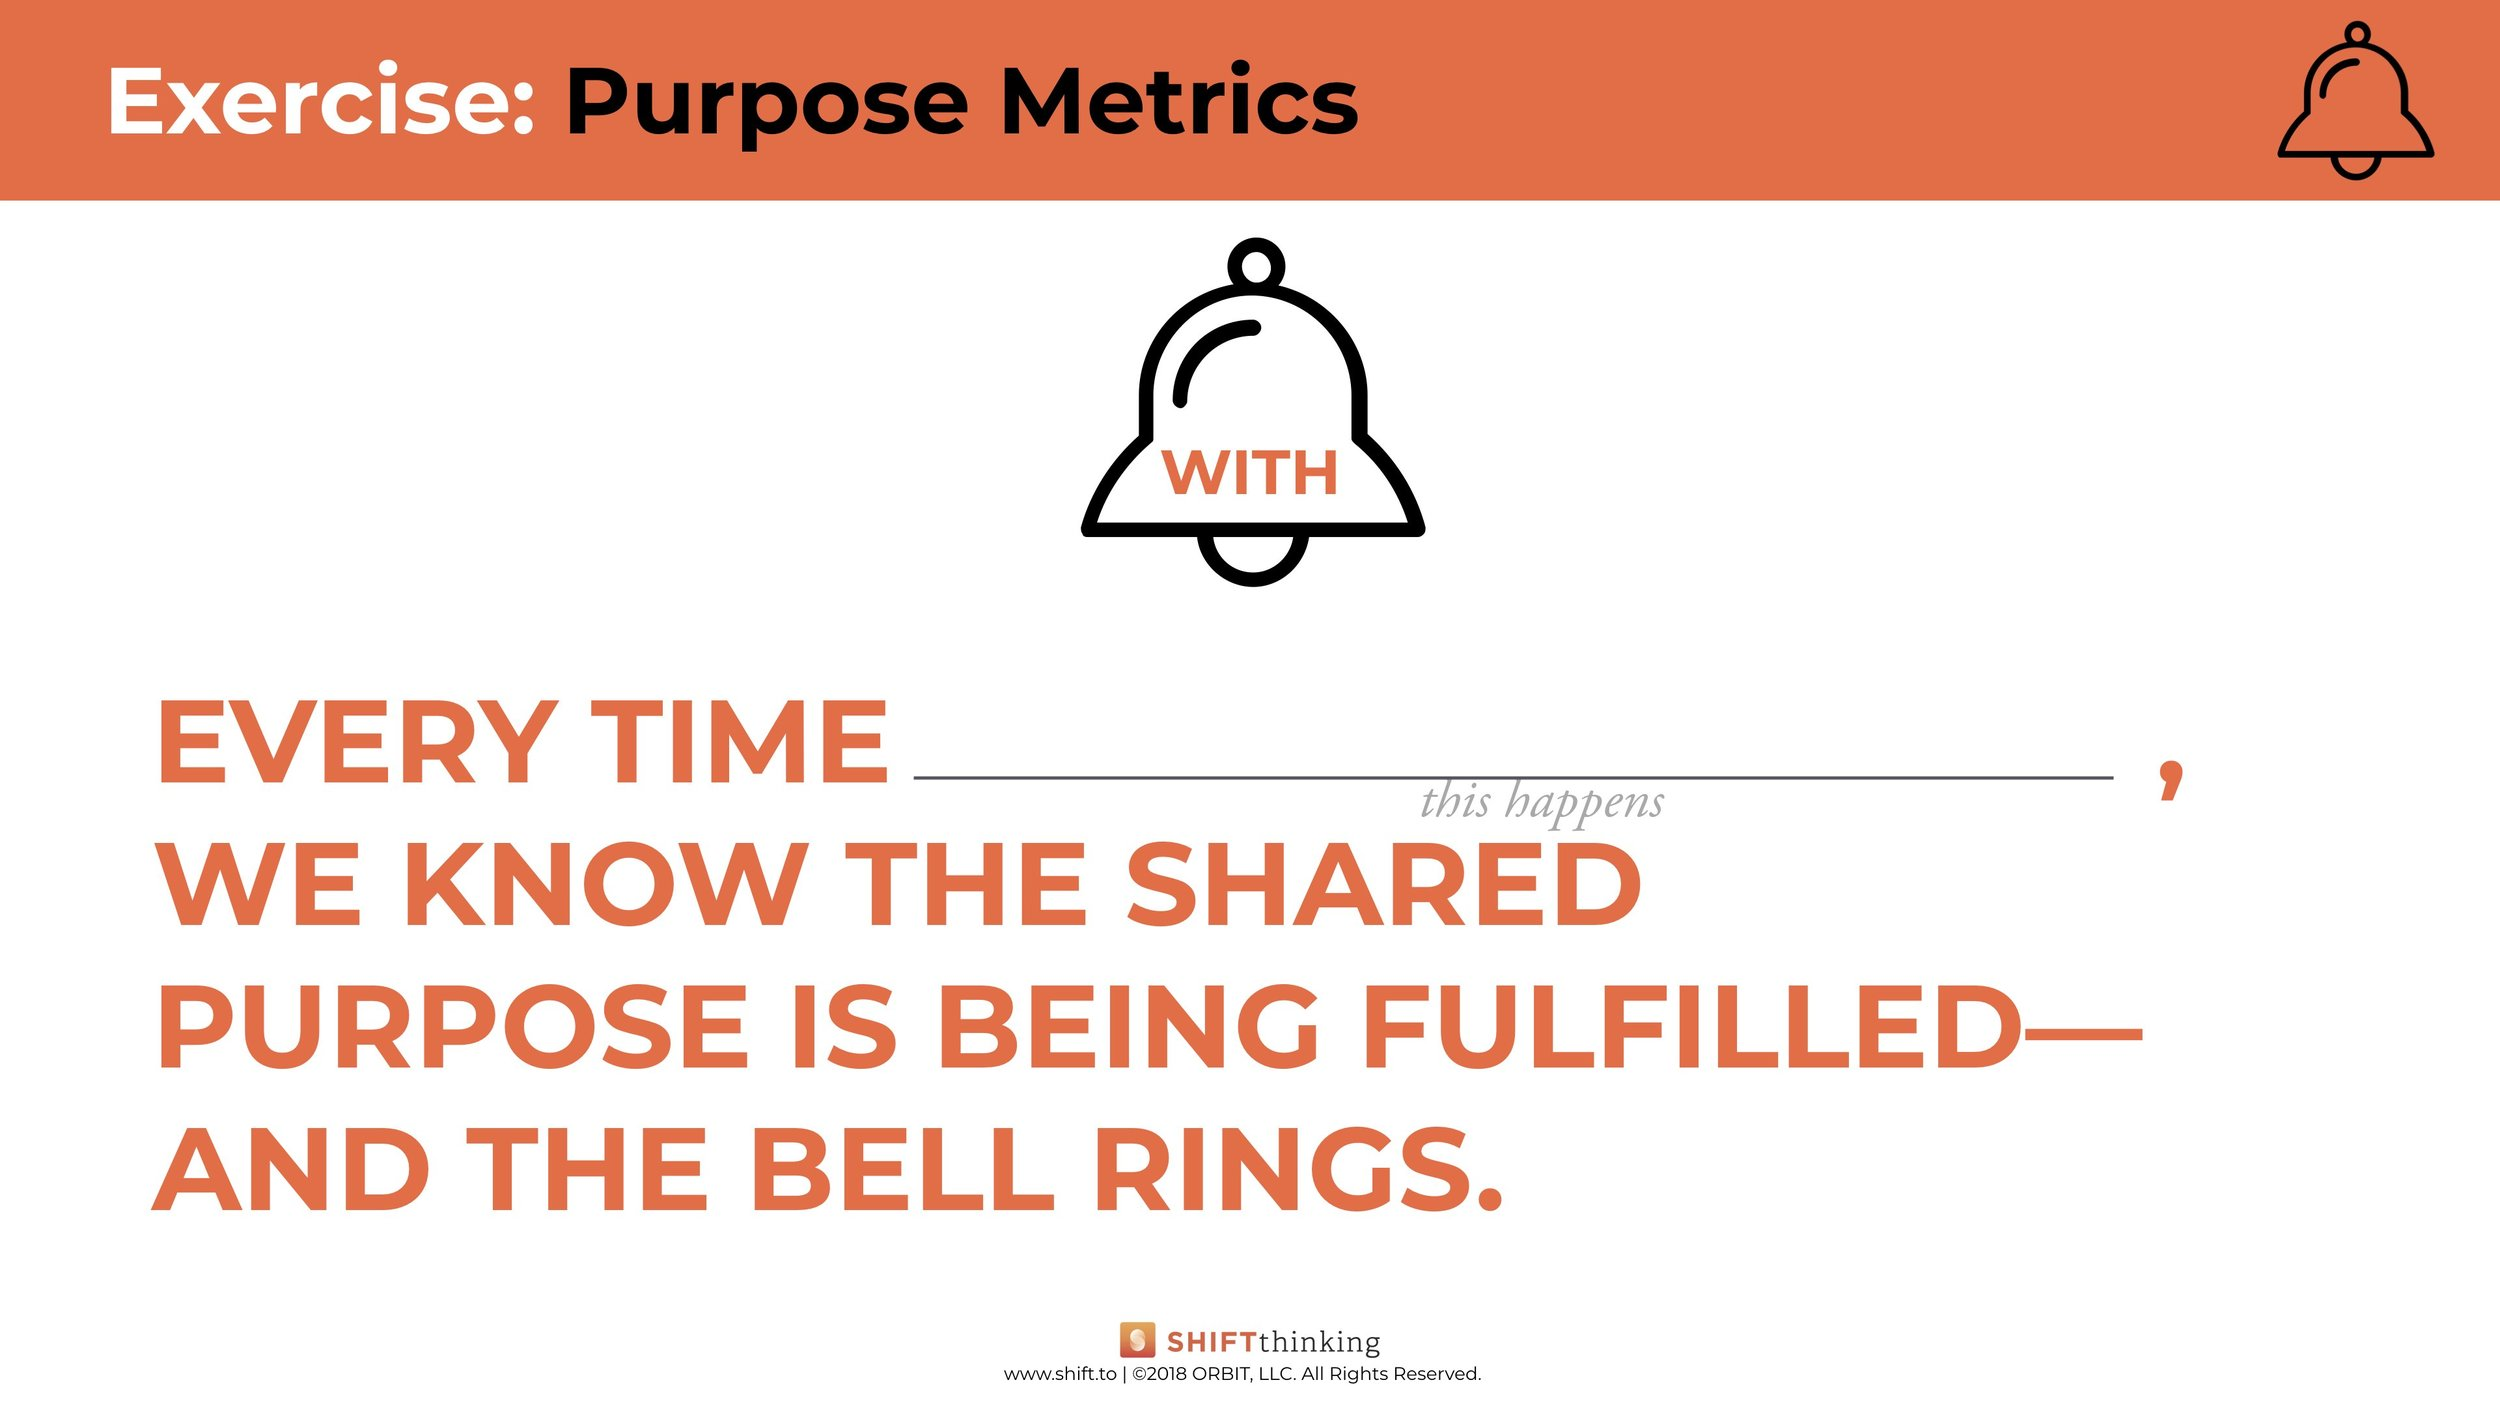 Exercise: Purpose Metrics